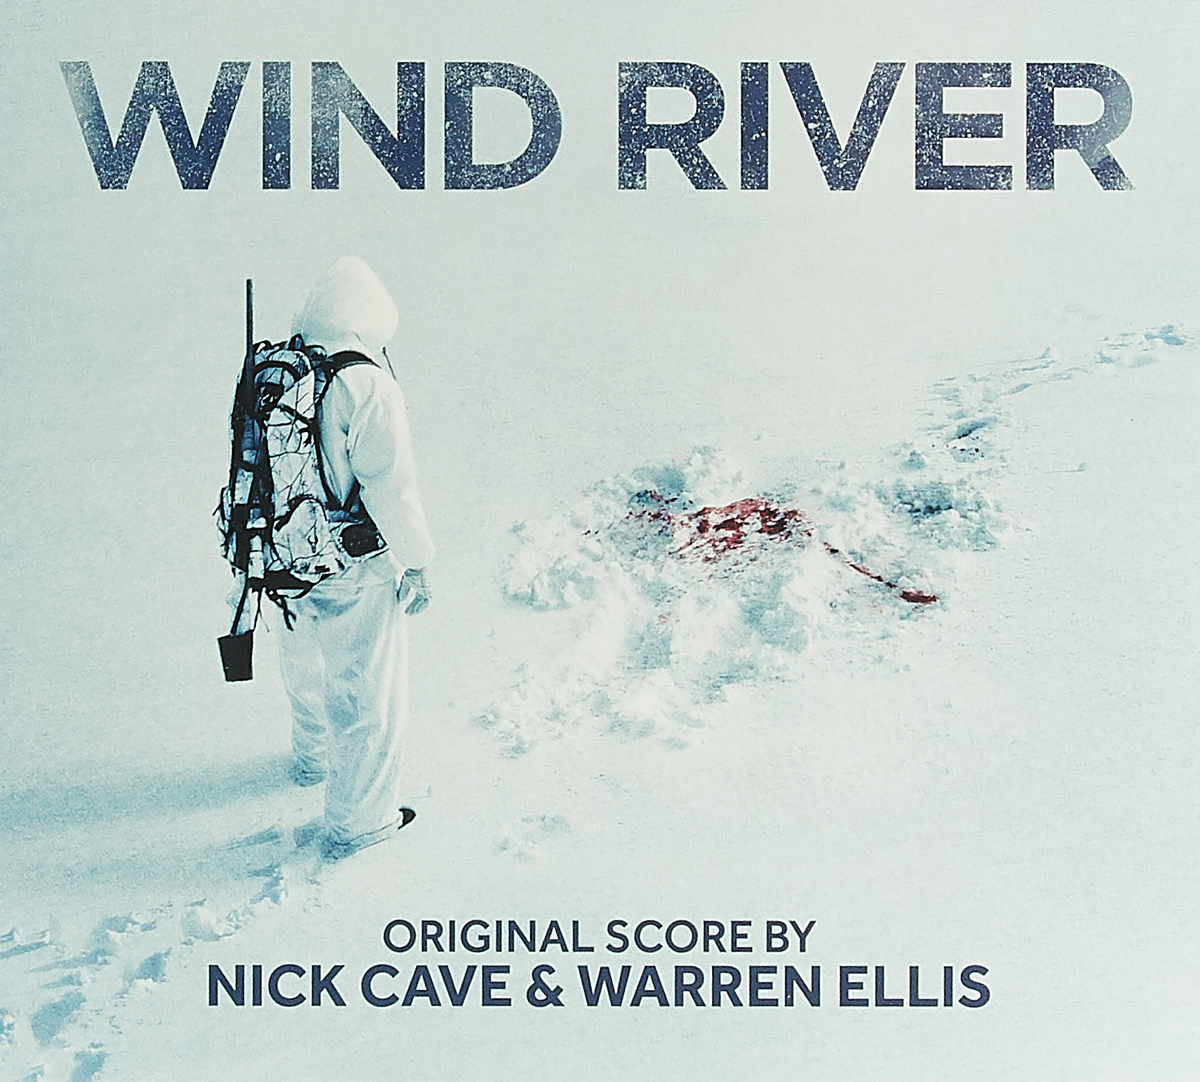 Ник Кейв,Уоррен Эллис Nick Cave & Warren Ellis. Wind River (Original Motion Picture Soundtrack) (CD) виниловая пластинка nick cave ellis warren kings ost